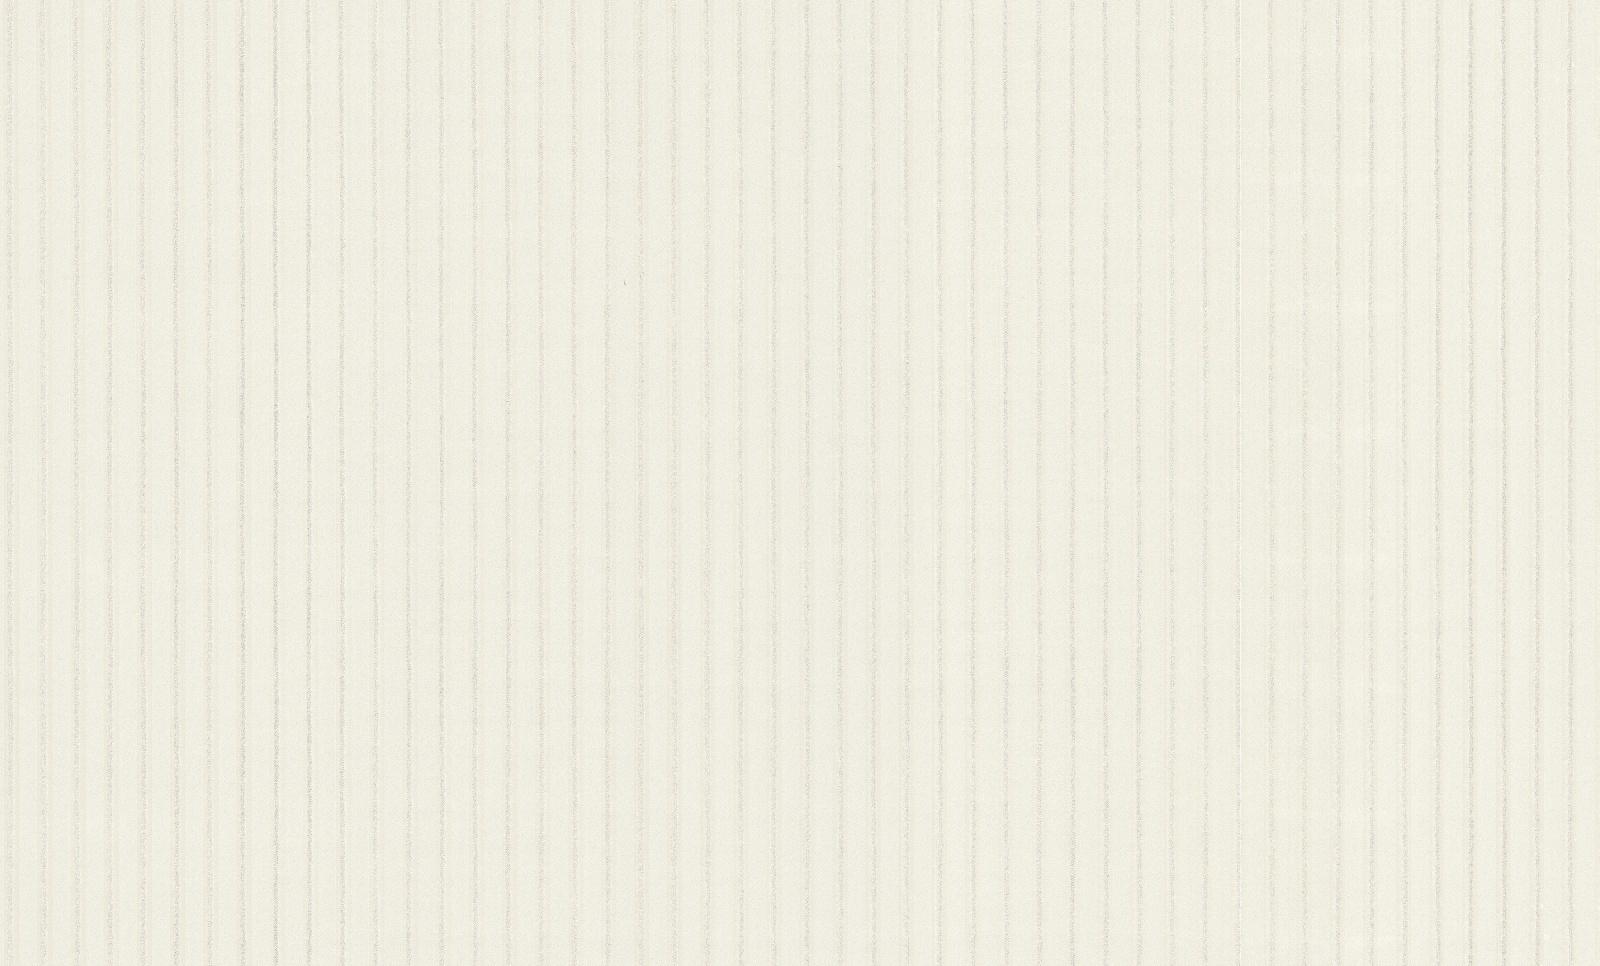 168207-10 ОБОИ 1,06*10 м флиз горяч тисн Династия полоса  бел